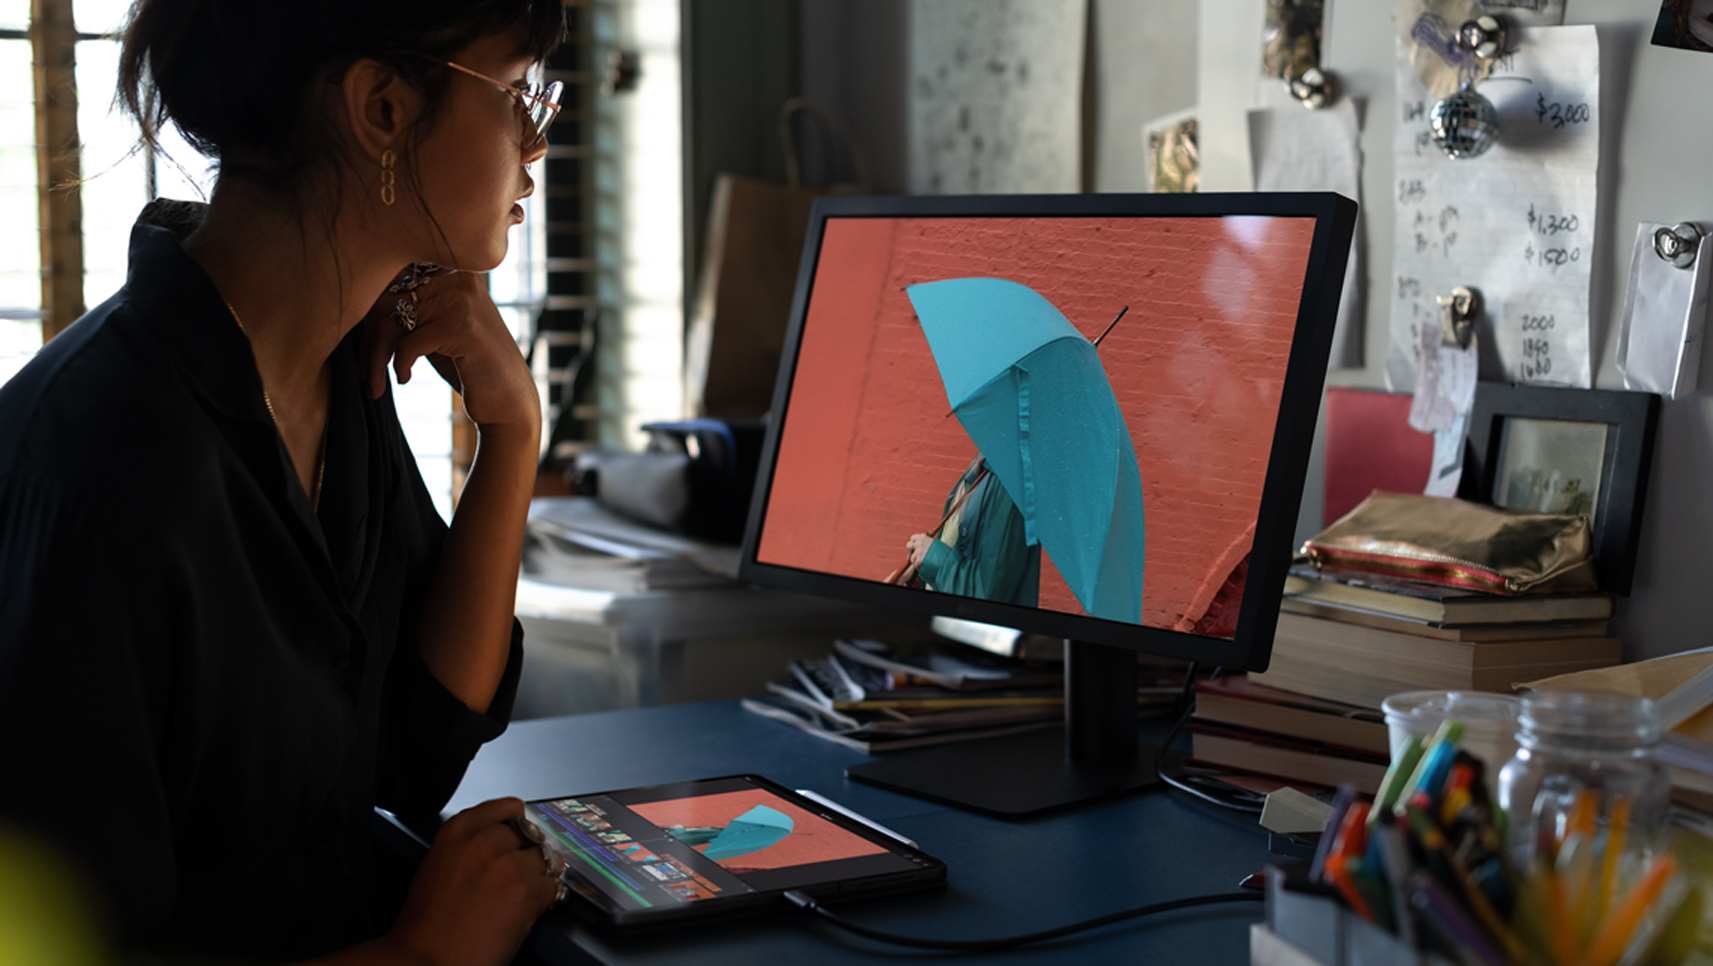 New iPad Pro: Power and Productivity, at a Price - TidBITS